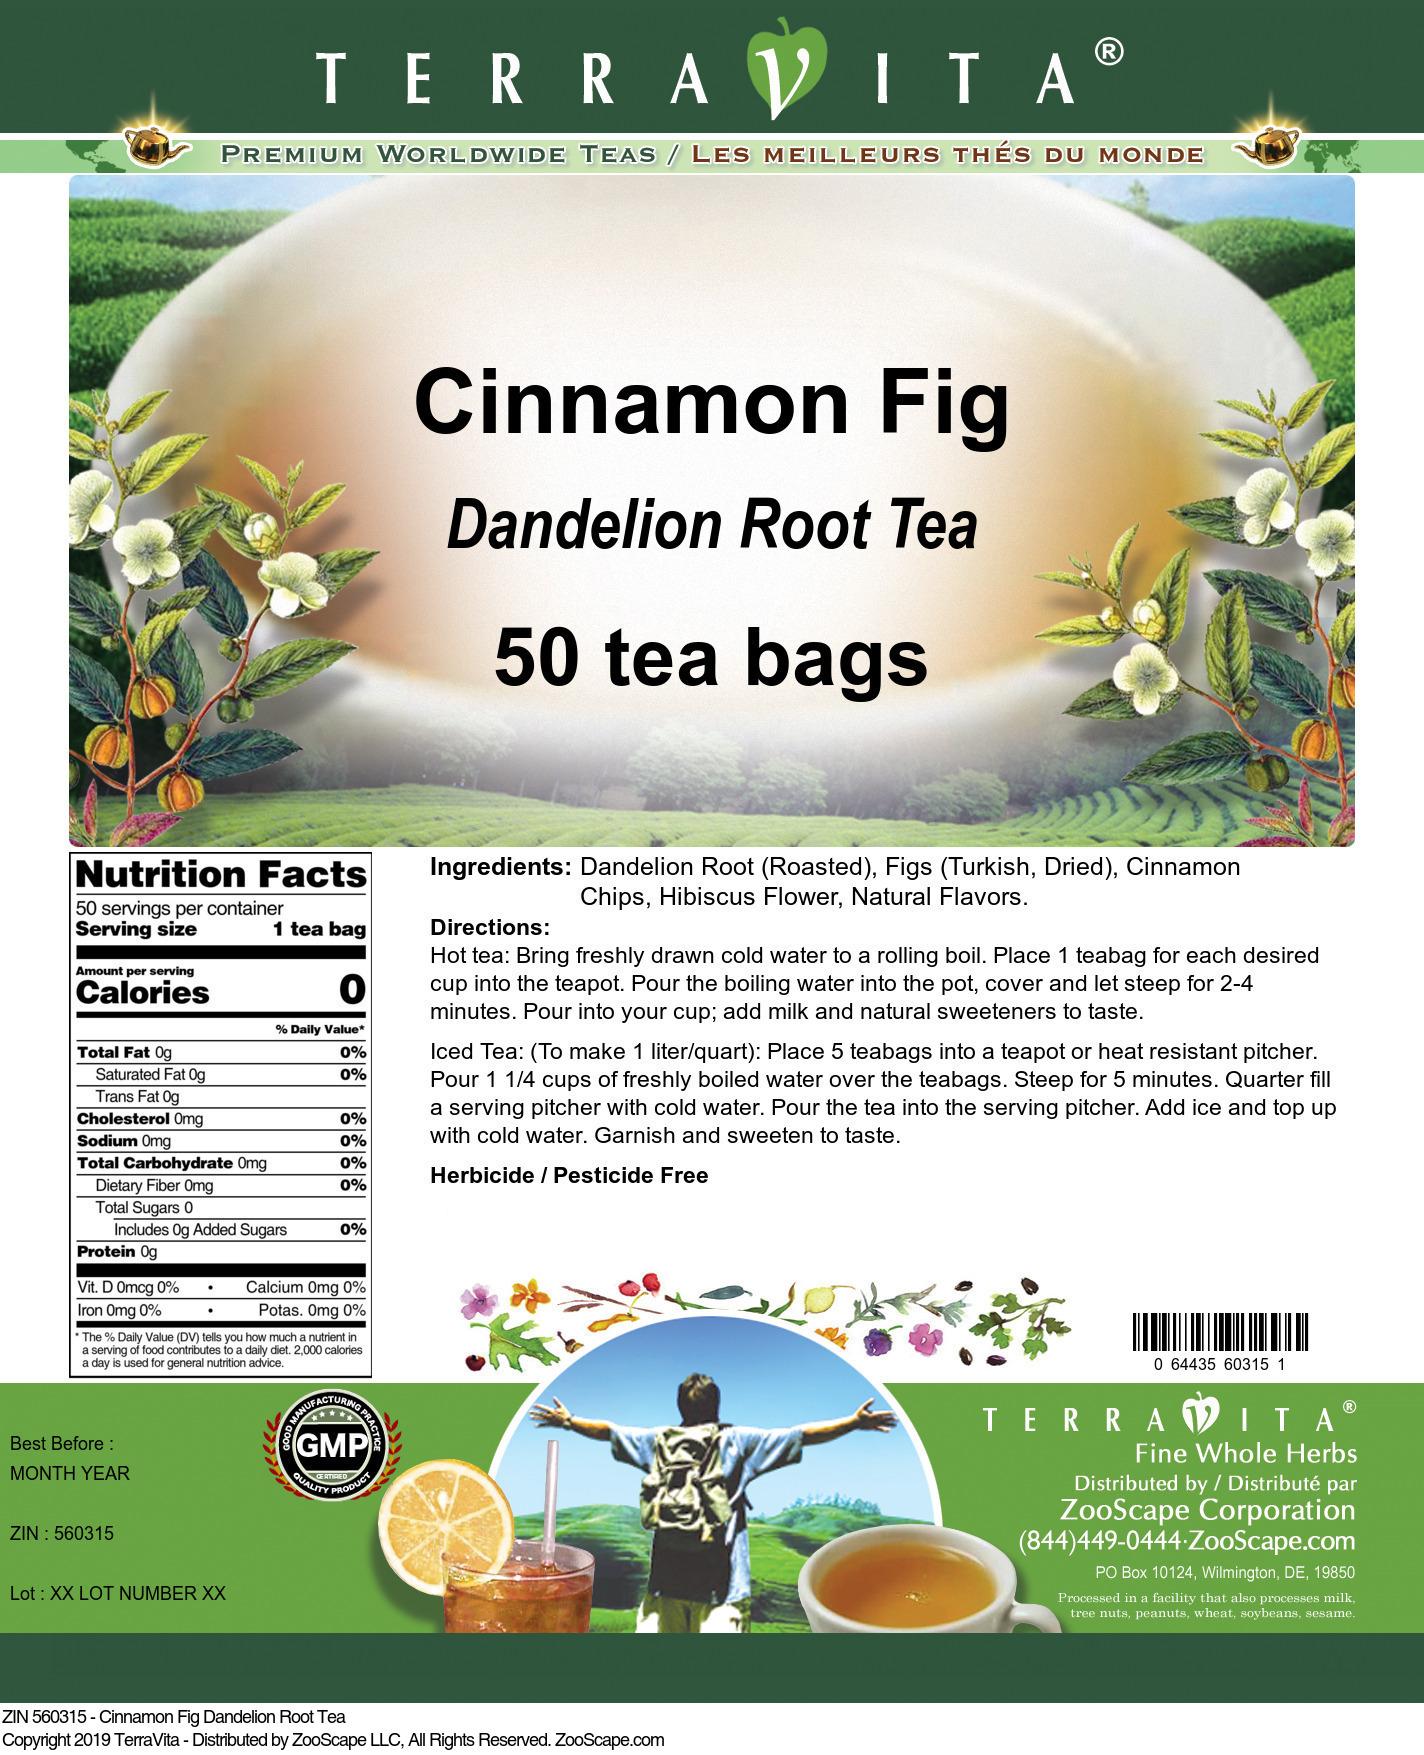 Cinnamon Fig Dandelion Root Tea